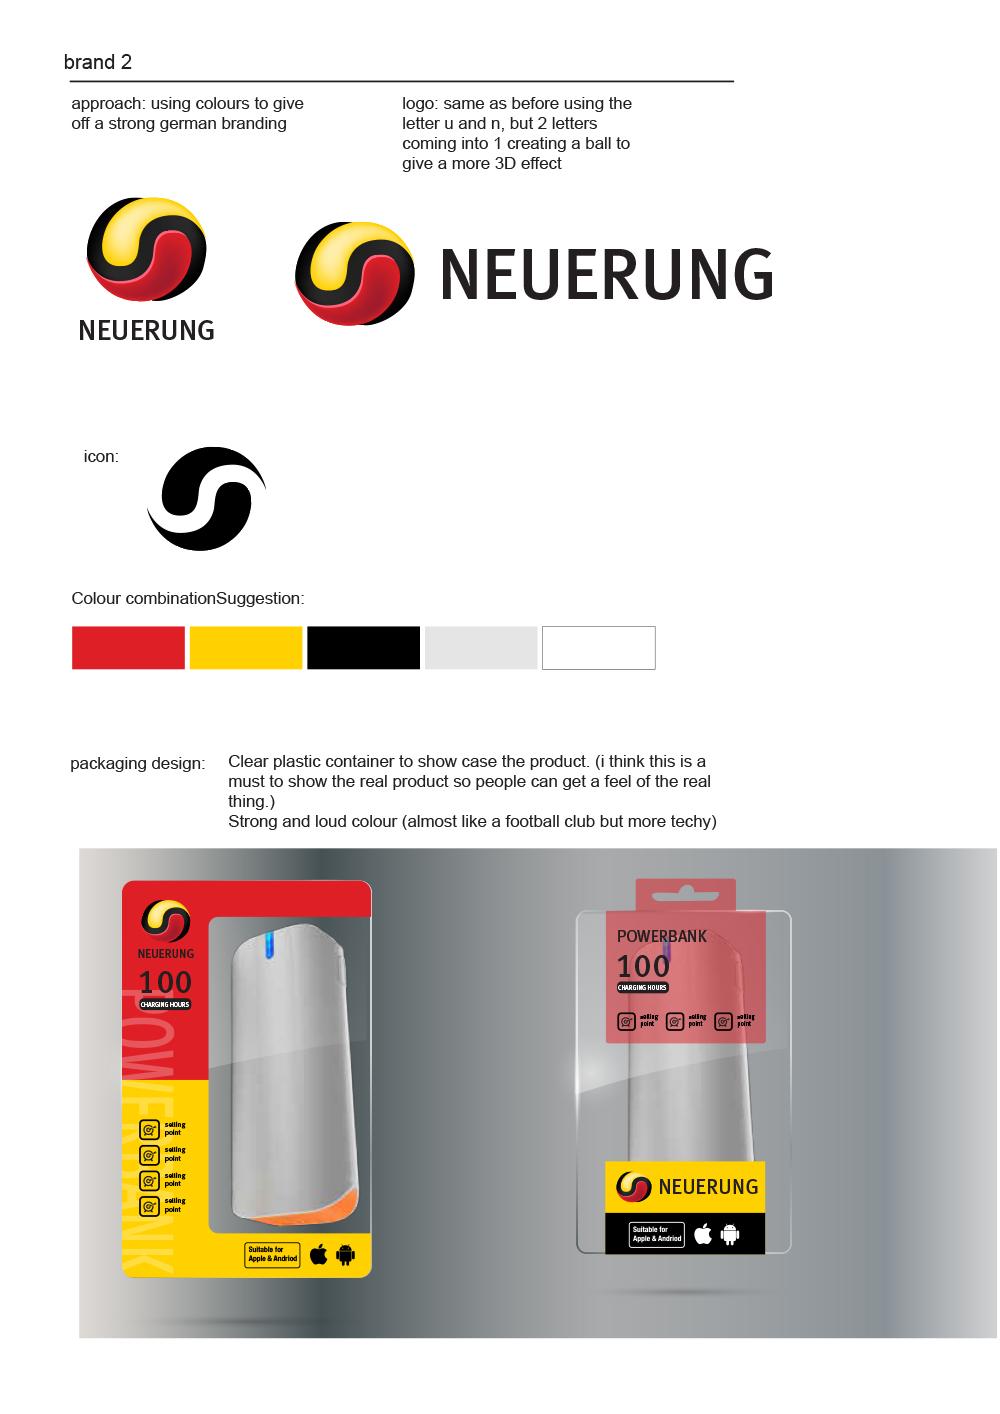 Power bank packaging